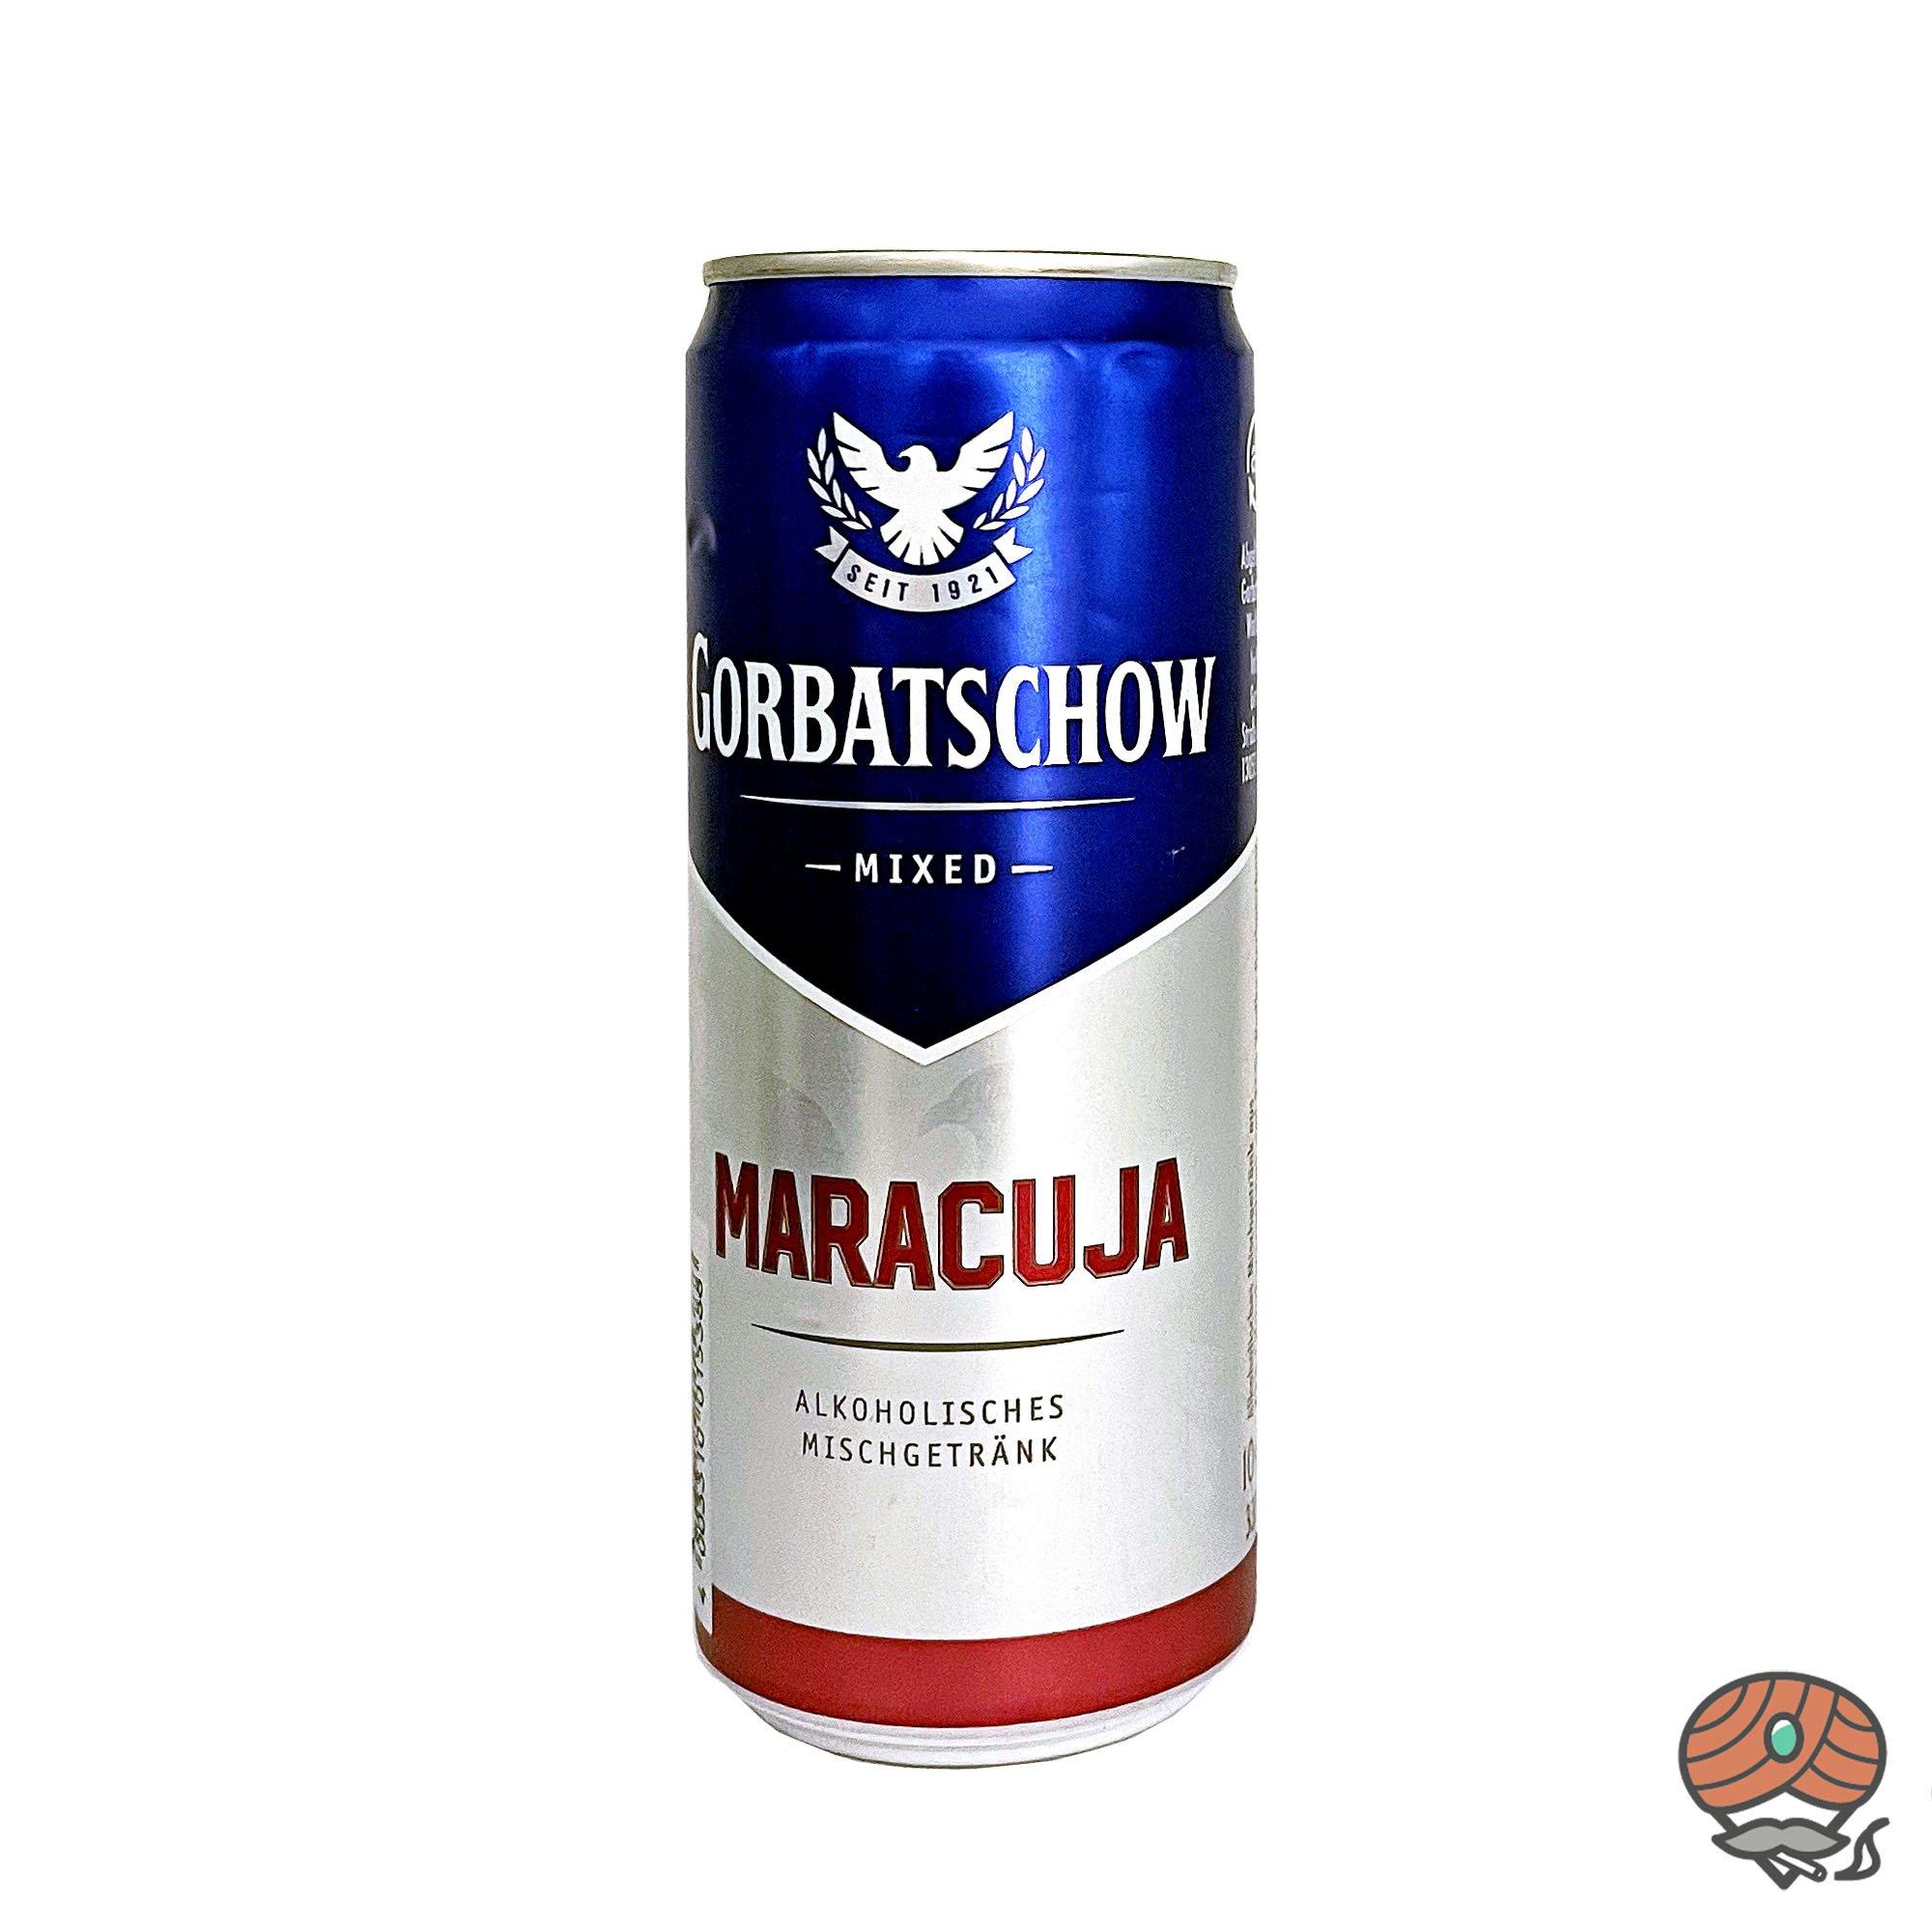 Gorbatschow Maracuja Mixed, alc. 10% Vol, inkl. 0,25 Euro Pfand